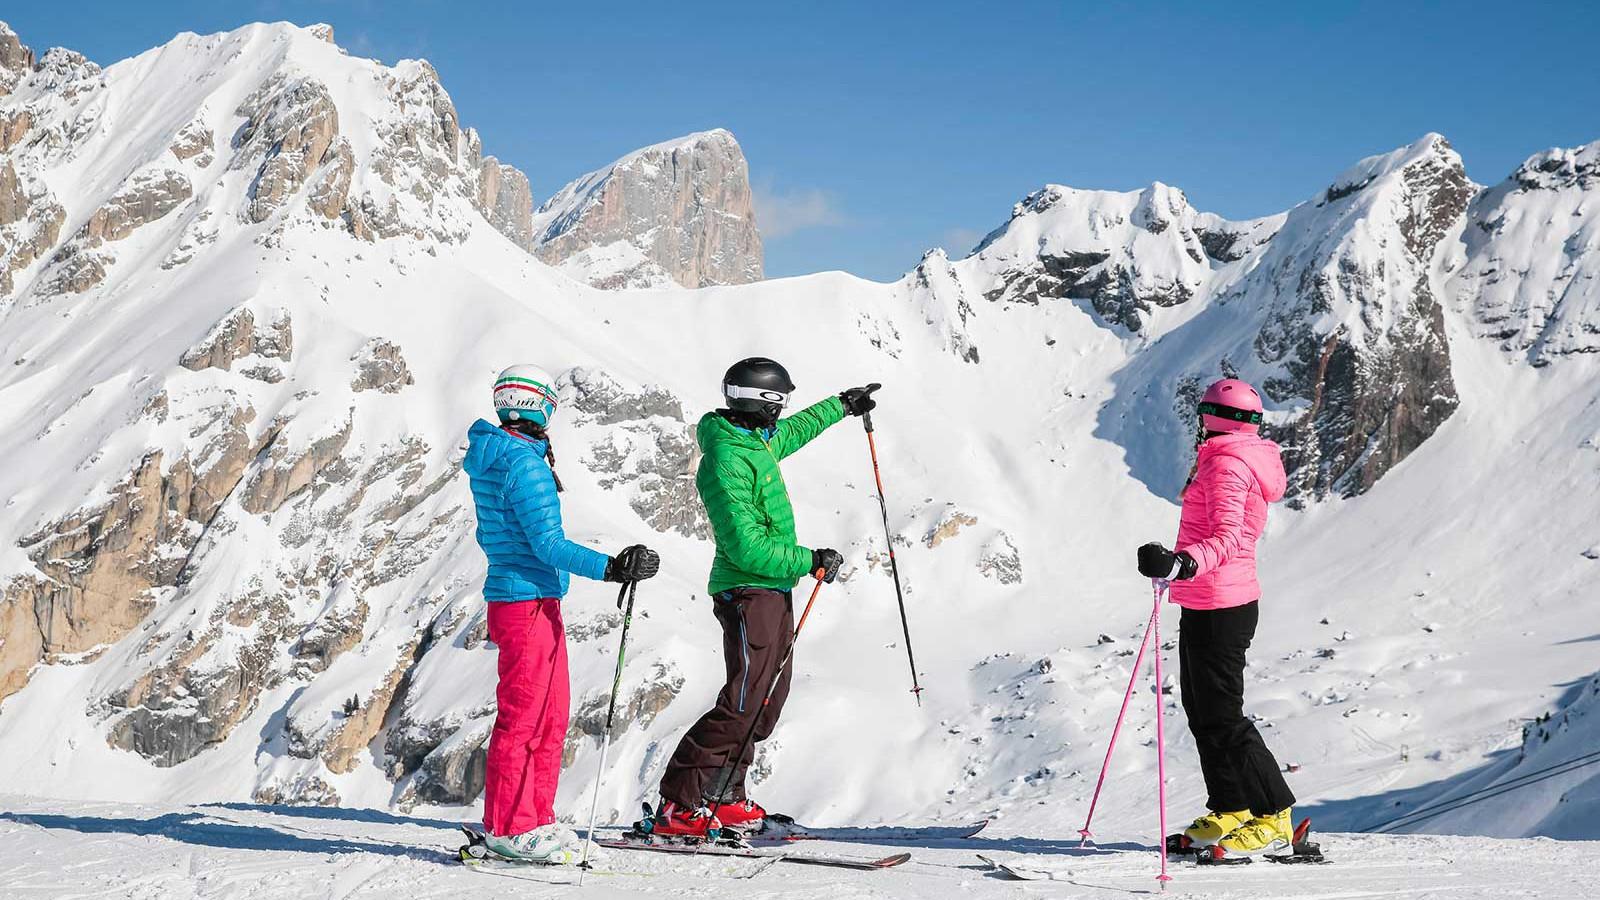 Val di Fassa people and mountains - ©Federico Modica